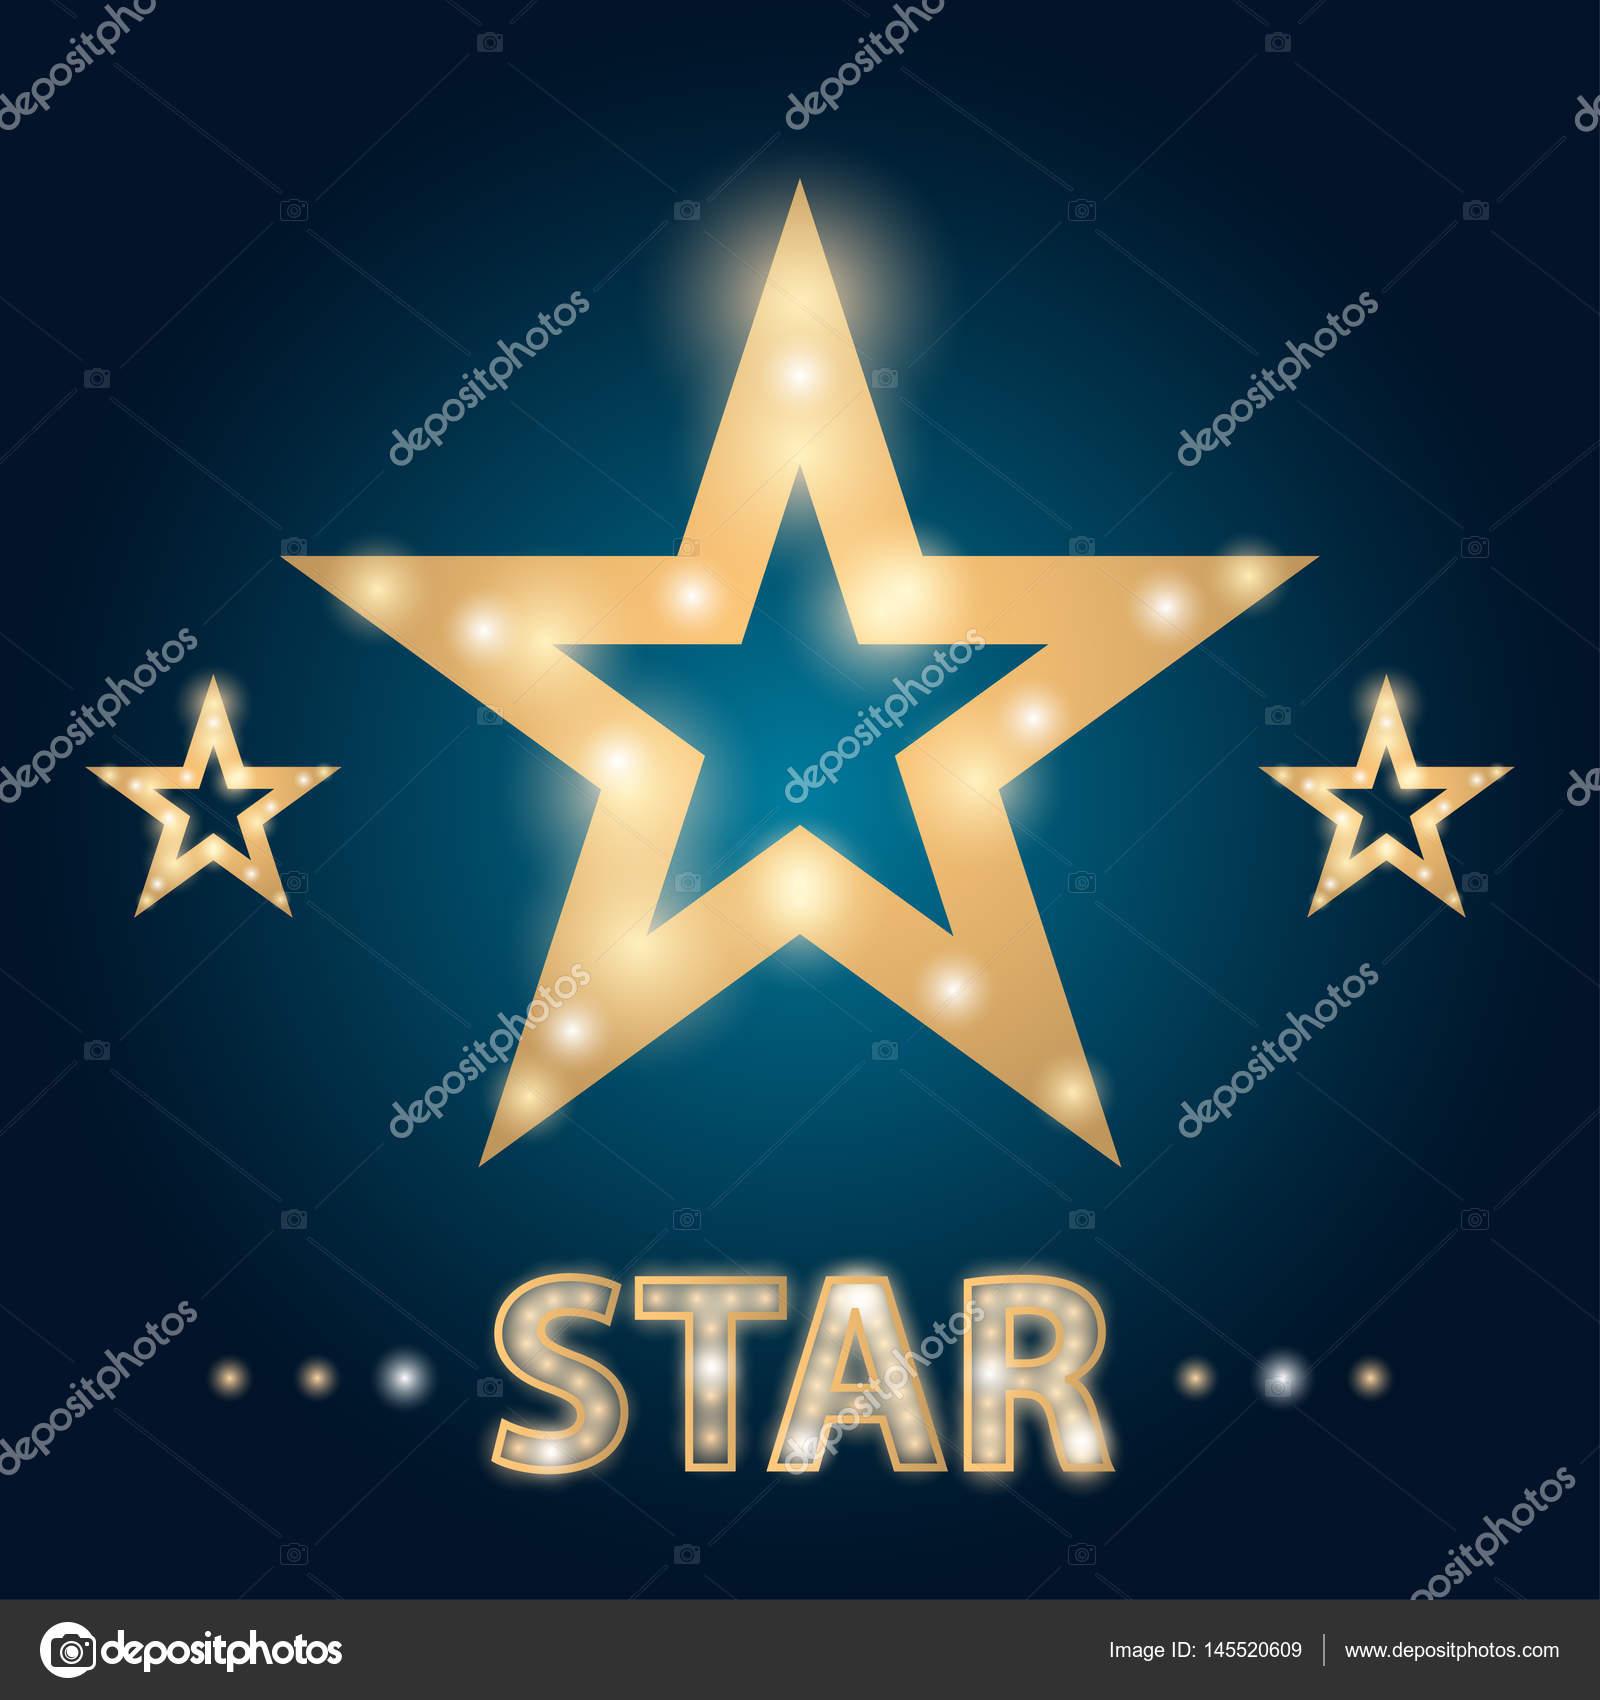 Retro Hollywood Stars Frame With Lights Vector Illustration